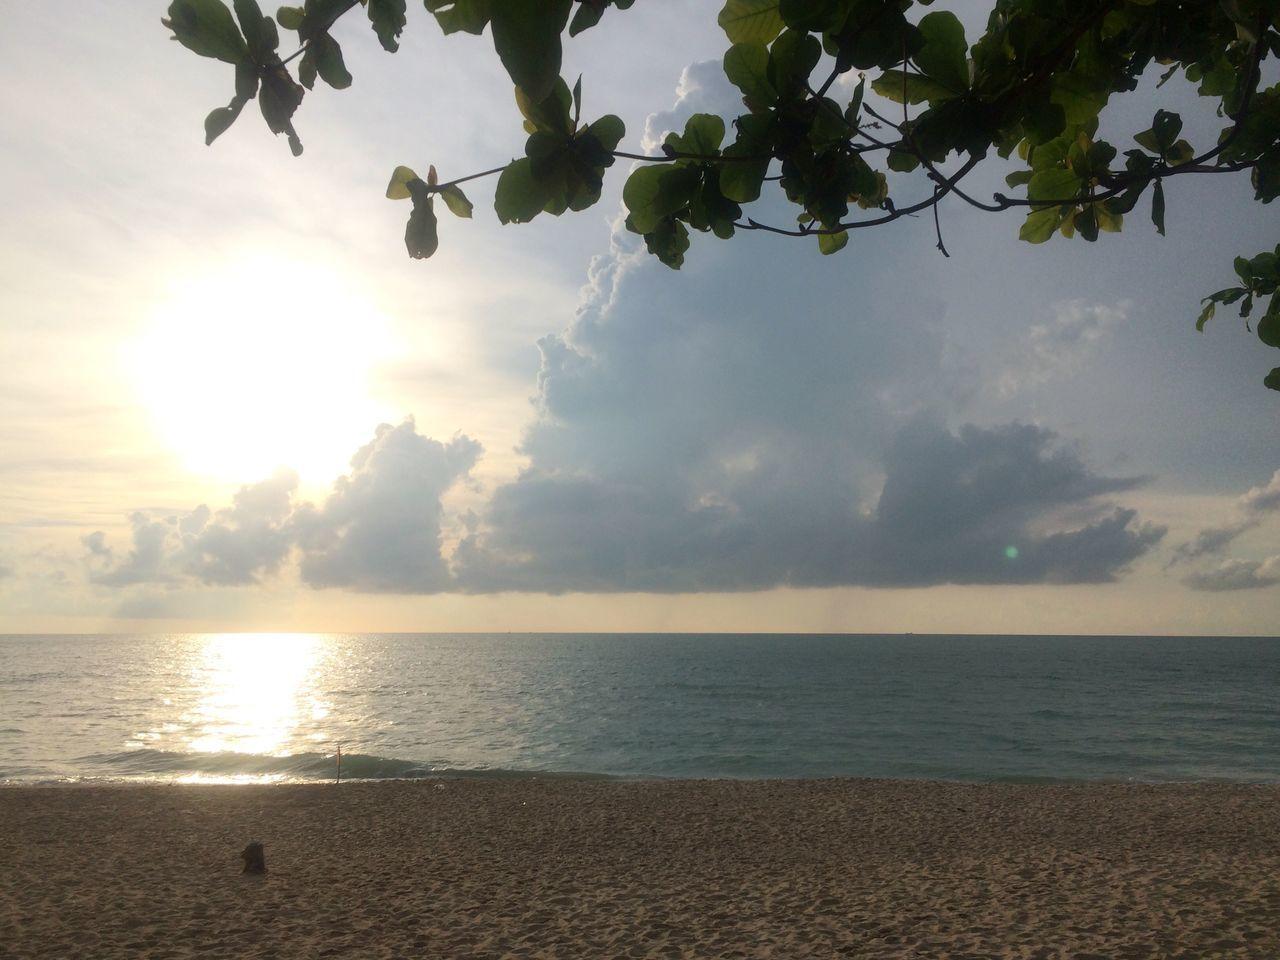 Sun Morning Beach Sea Sand Light Morning Light Tree Leaves Thailand Nakhon Si Thammarat Khanom South Peaceful Landscape Nature